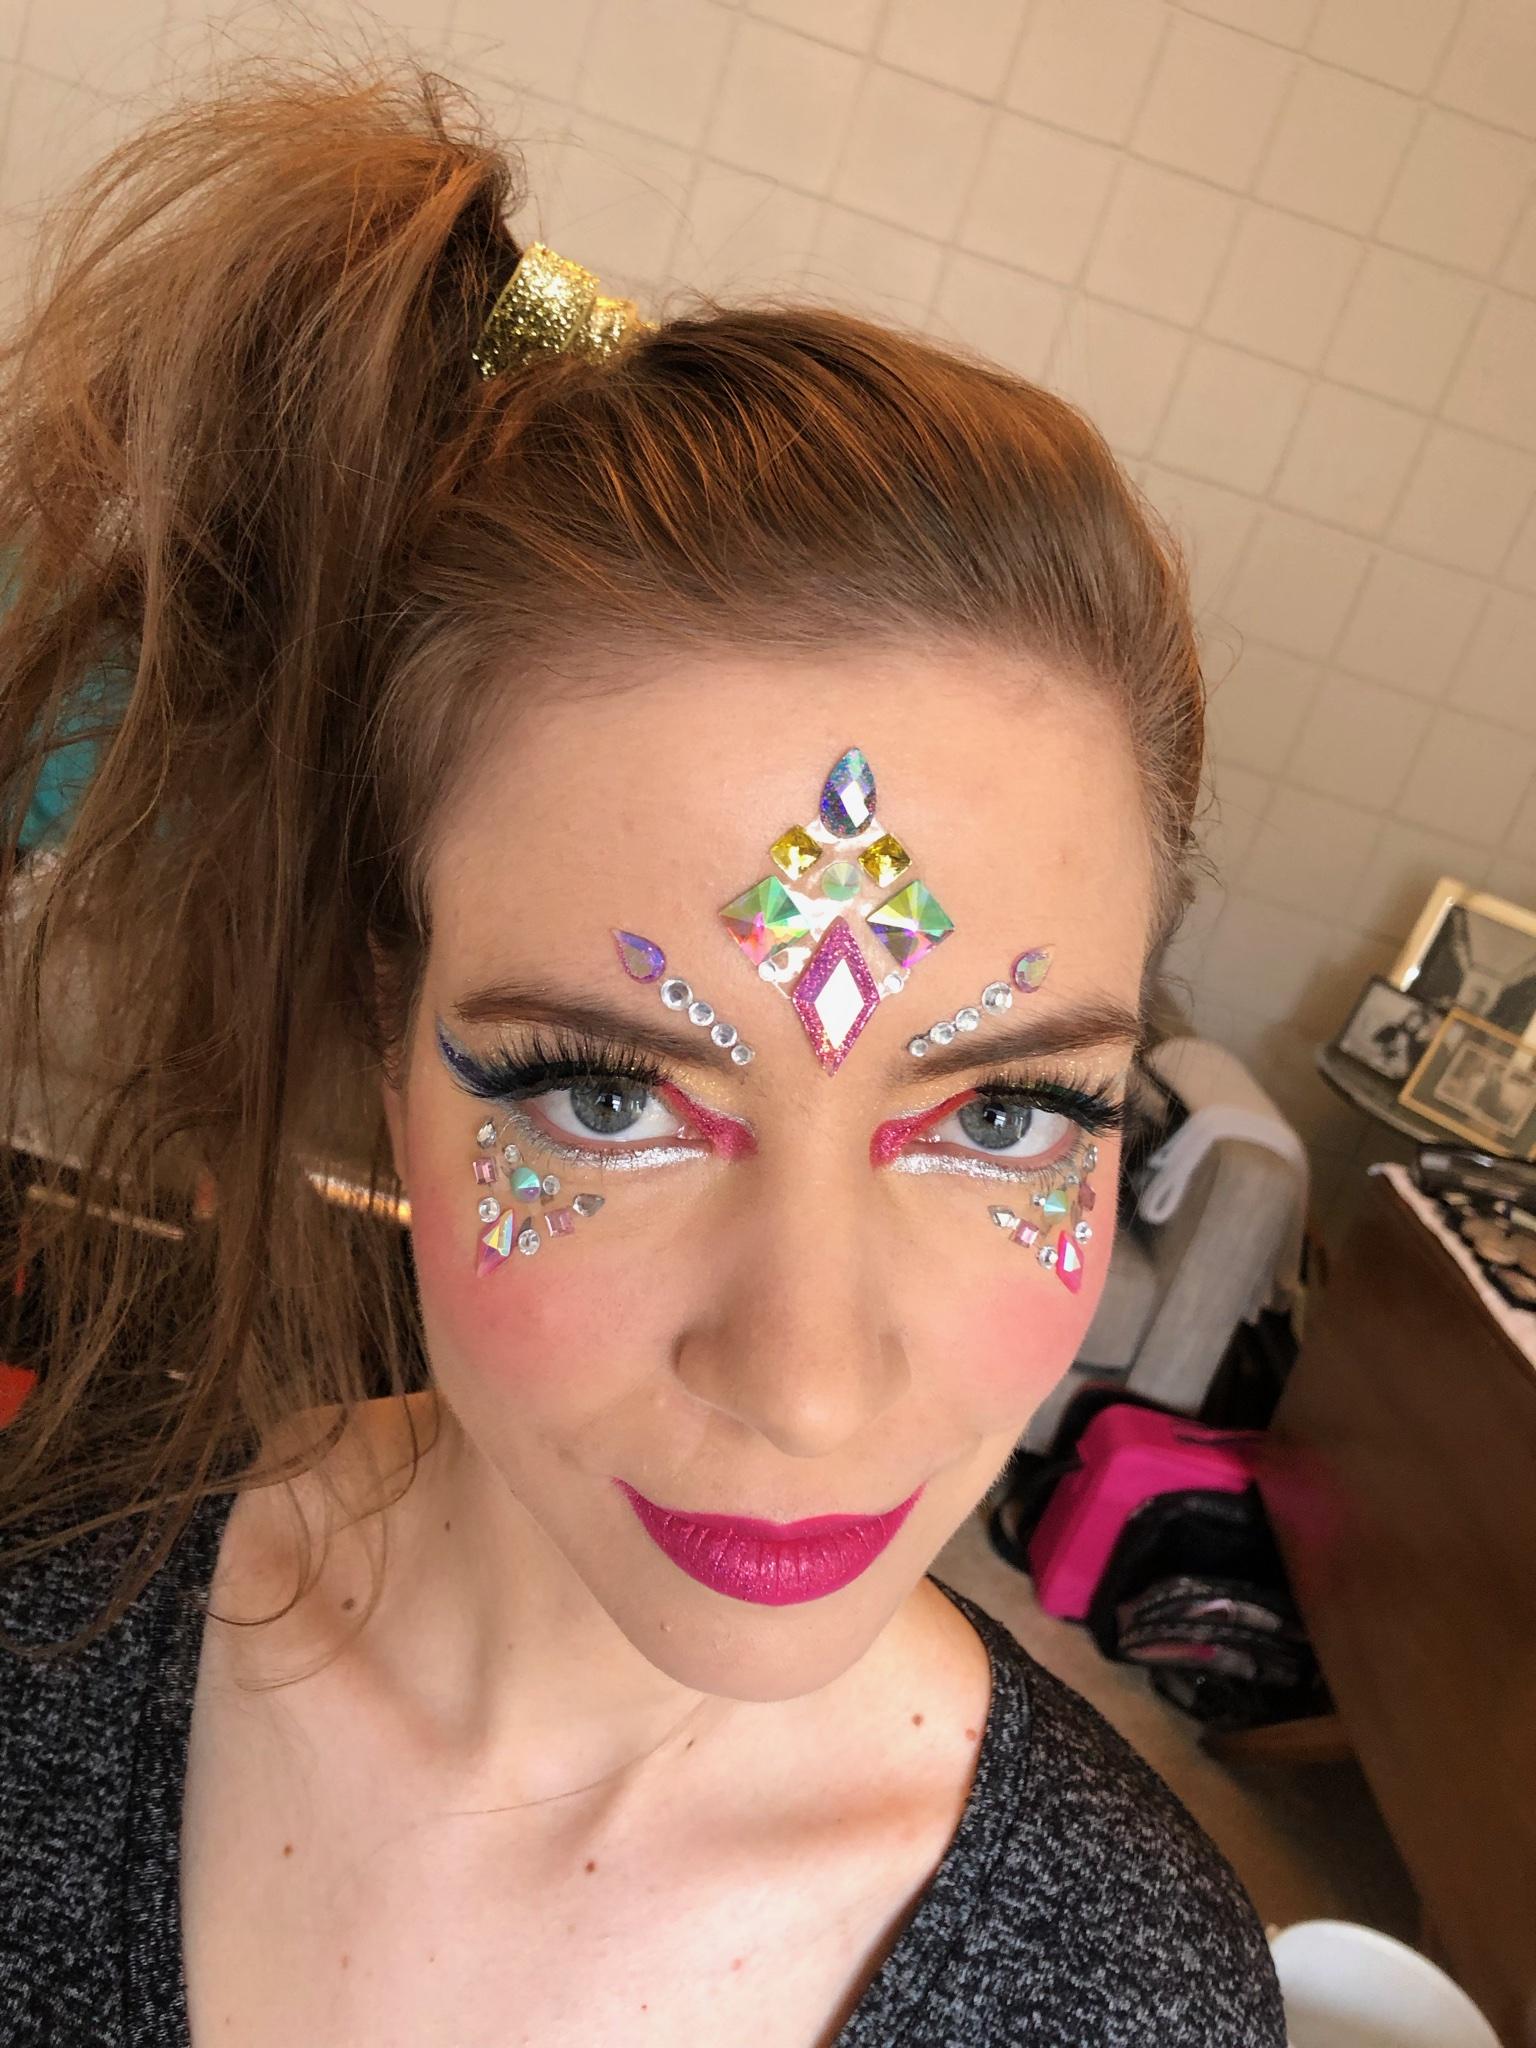 Image of fun makeup design with jewels